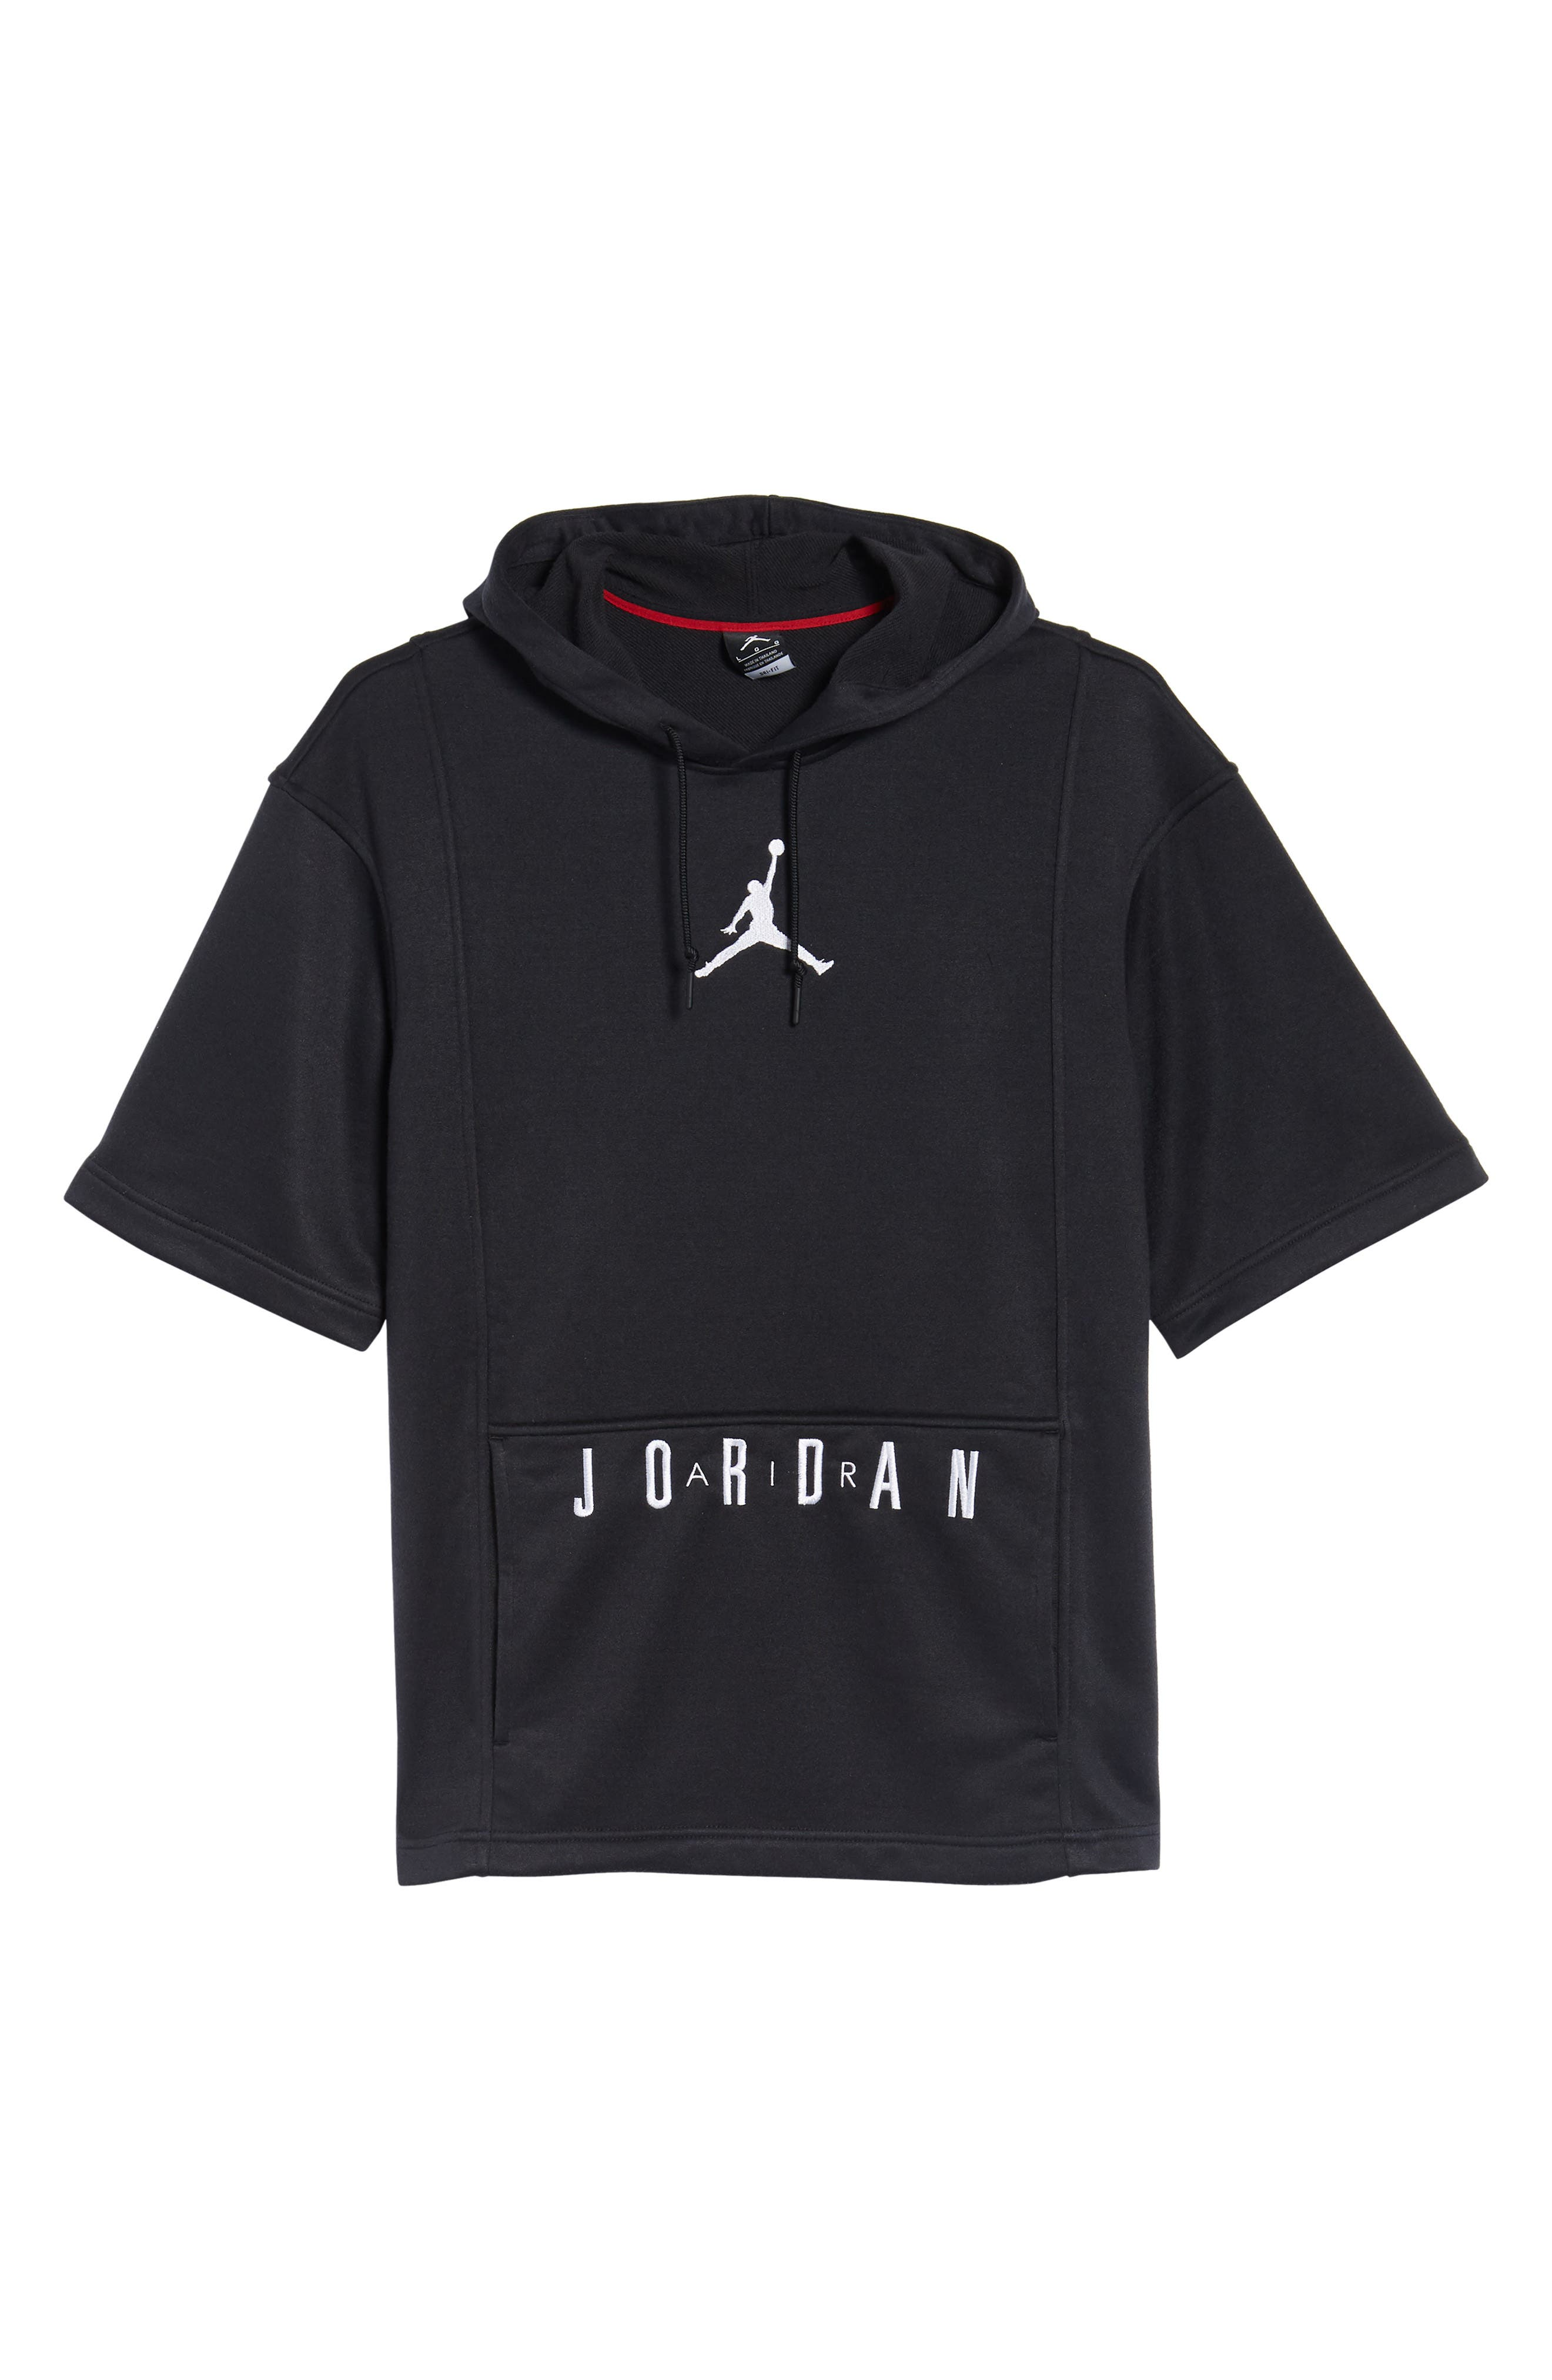 Nike Air Jordon Short Sleeve Basketball Hoodie,                             Alternate thumbnail 6, color,                             BLACK/ WHITE